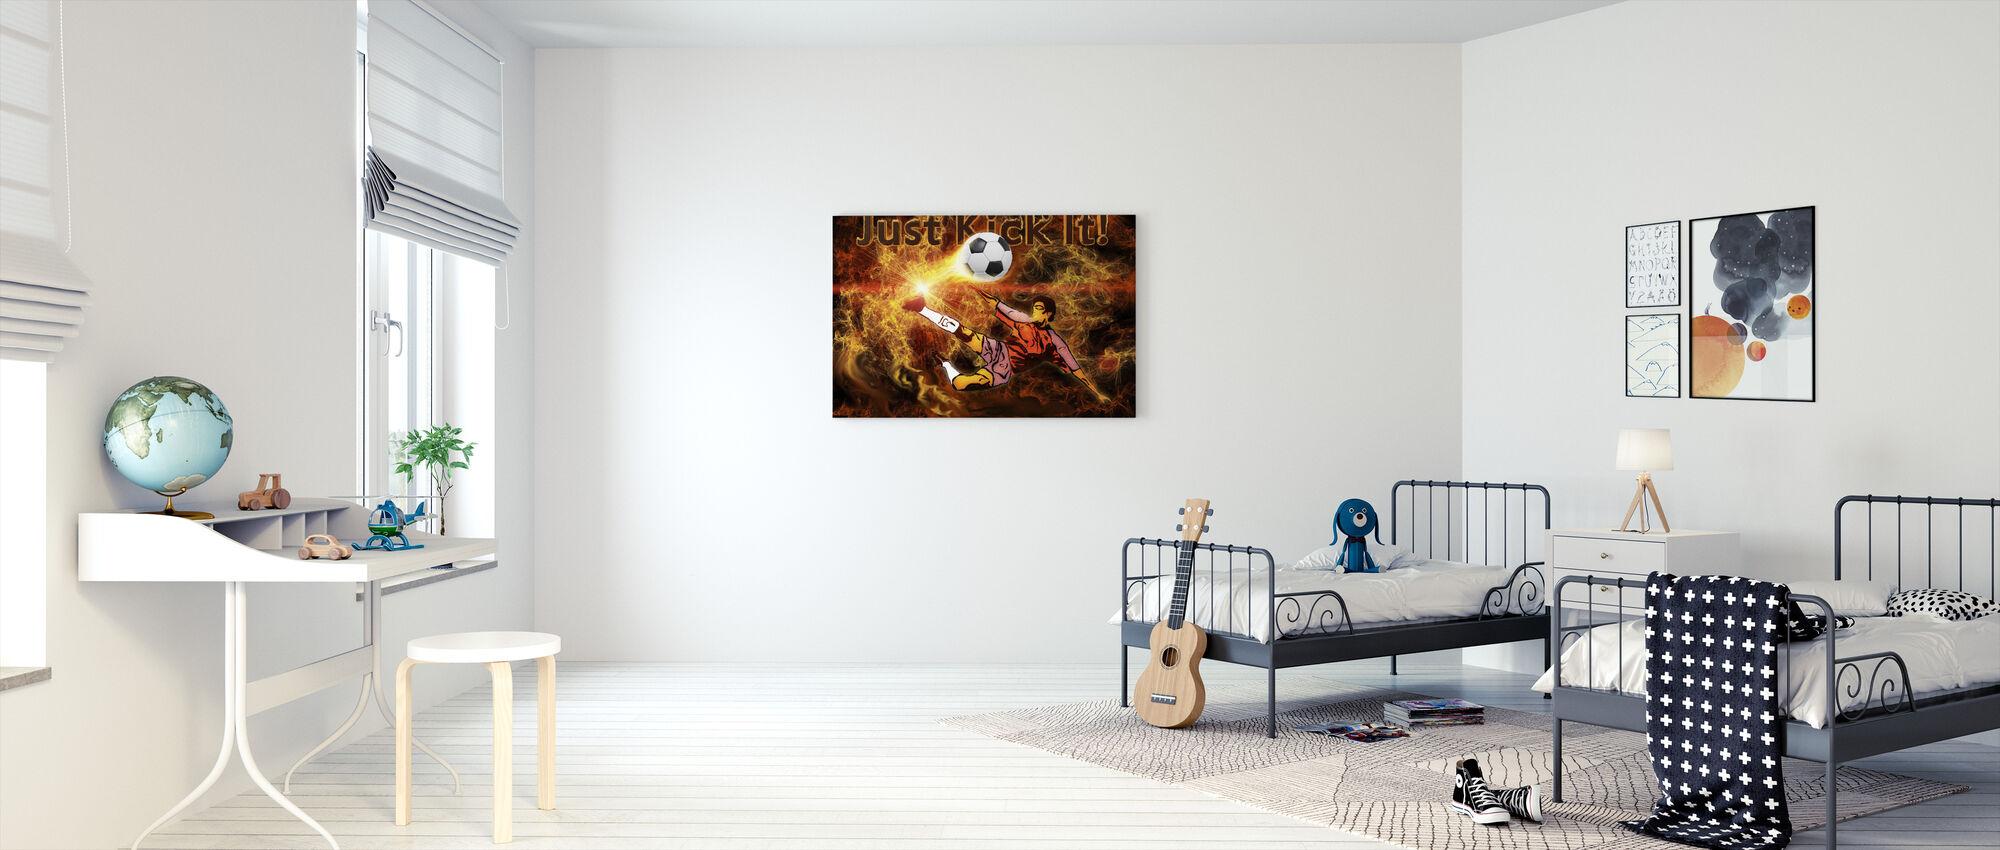 Soccer Heat - Canvas print - Kids Room